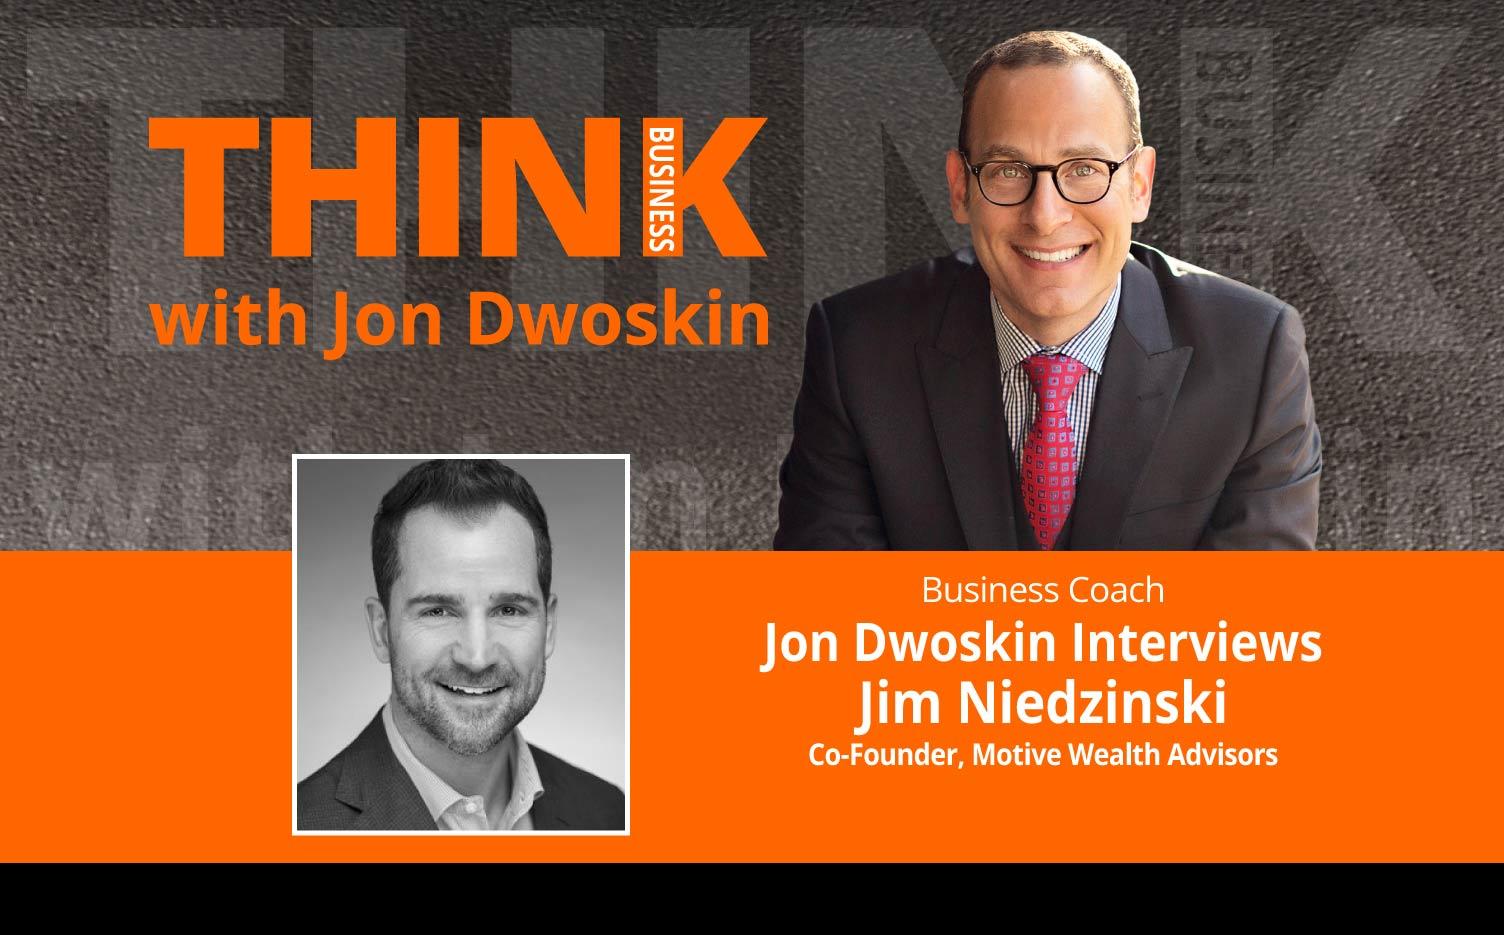 THINK Business Podcast: Jon Dwoskin Interviews Jim Niedzinski, Co-Founder, Motive Wealth Advisors